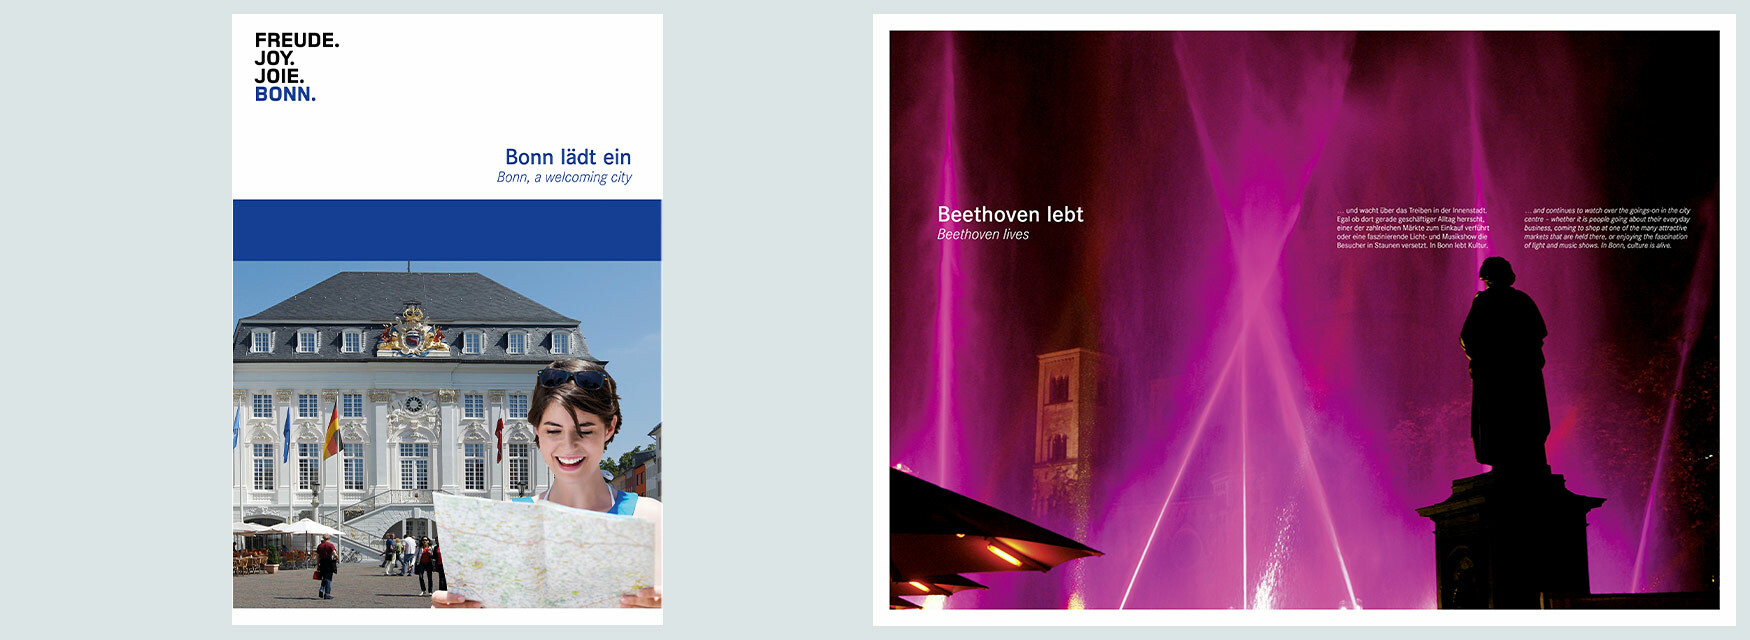 Design Stadt Bonn